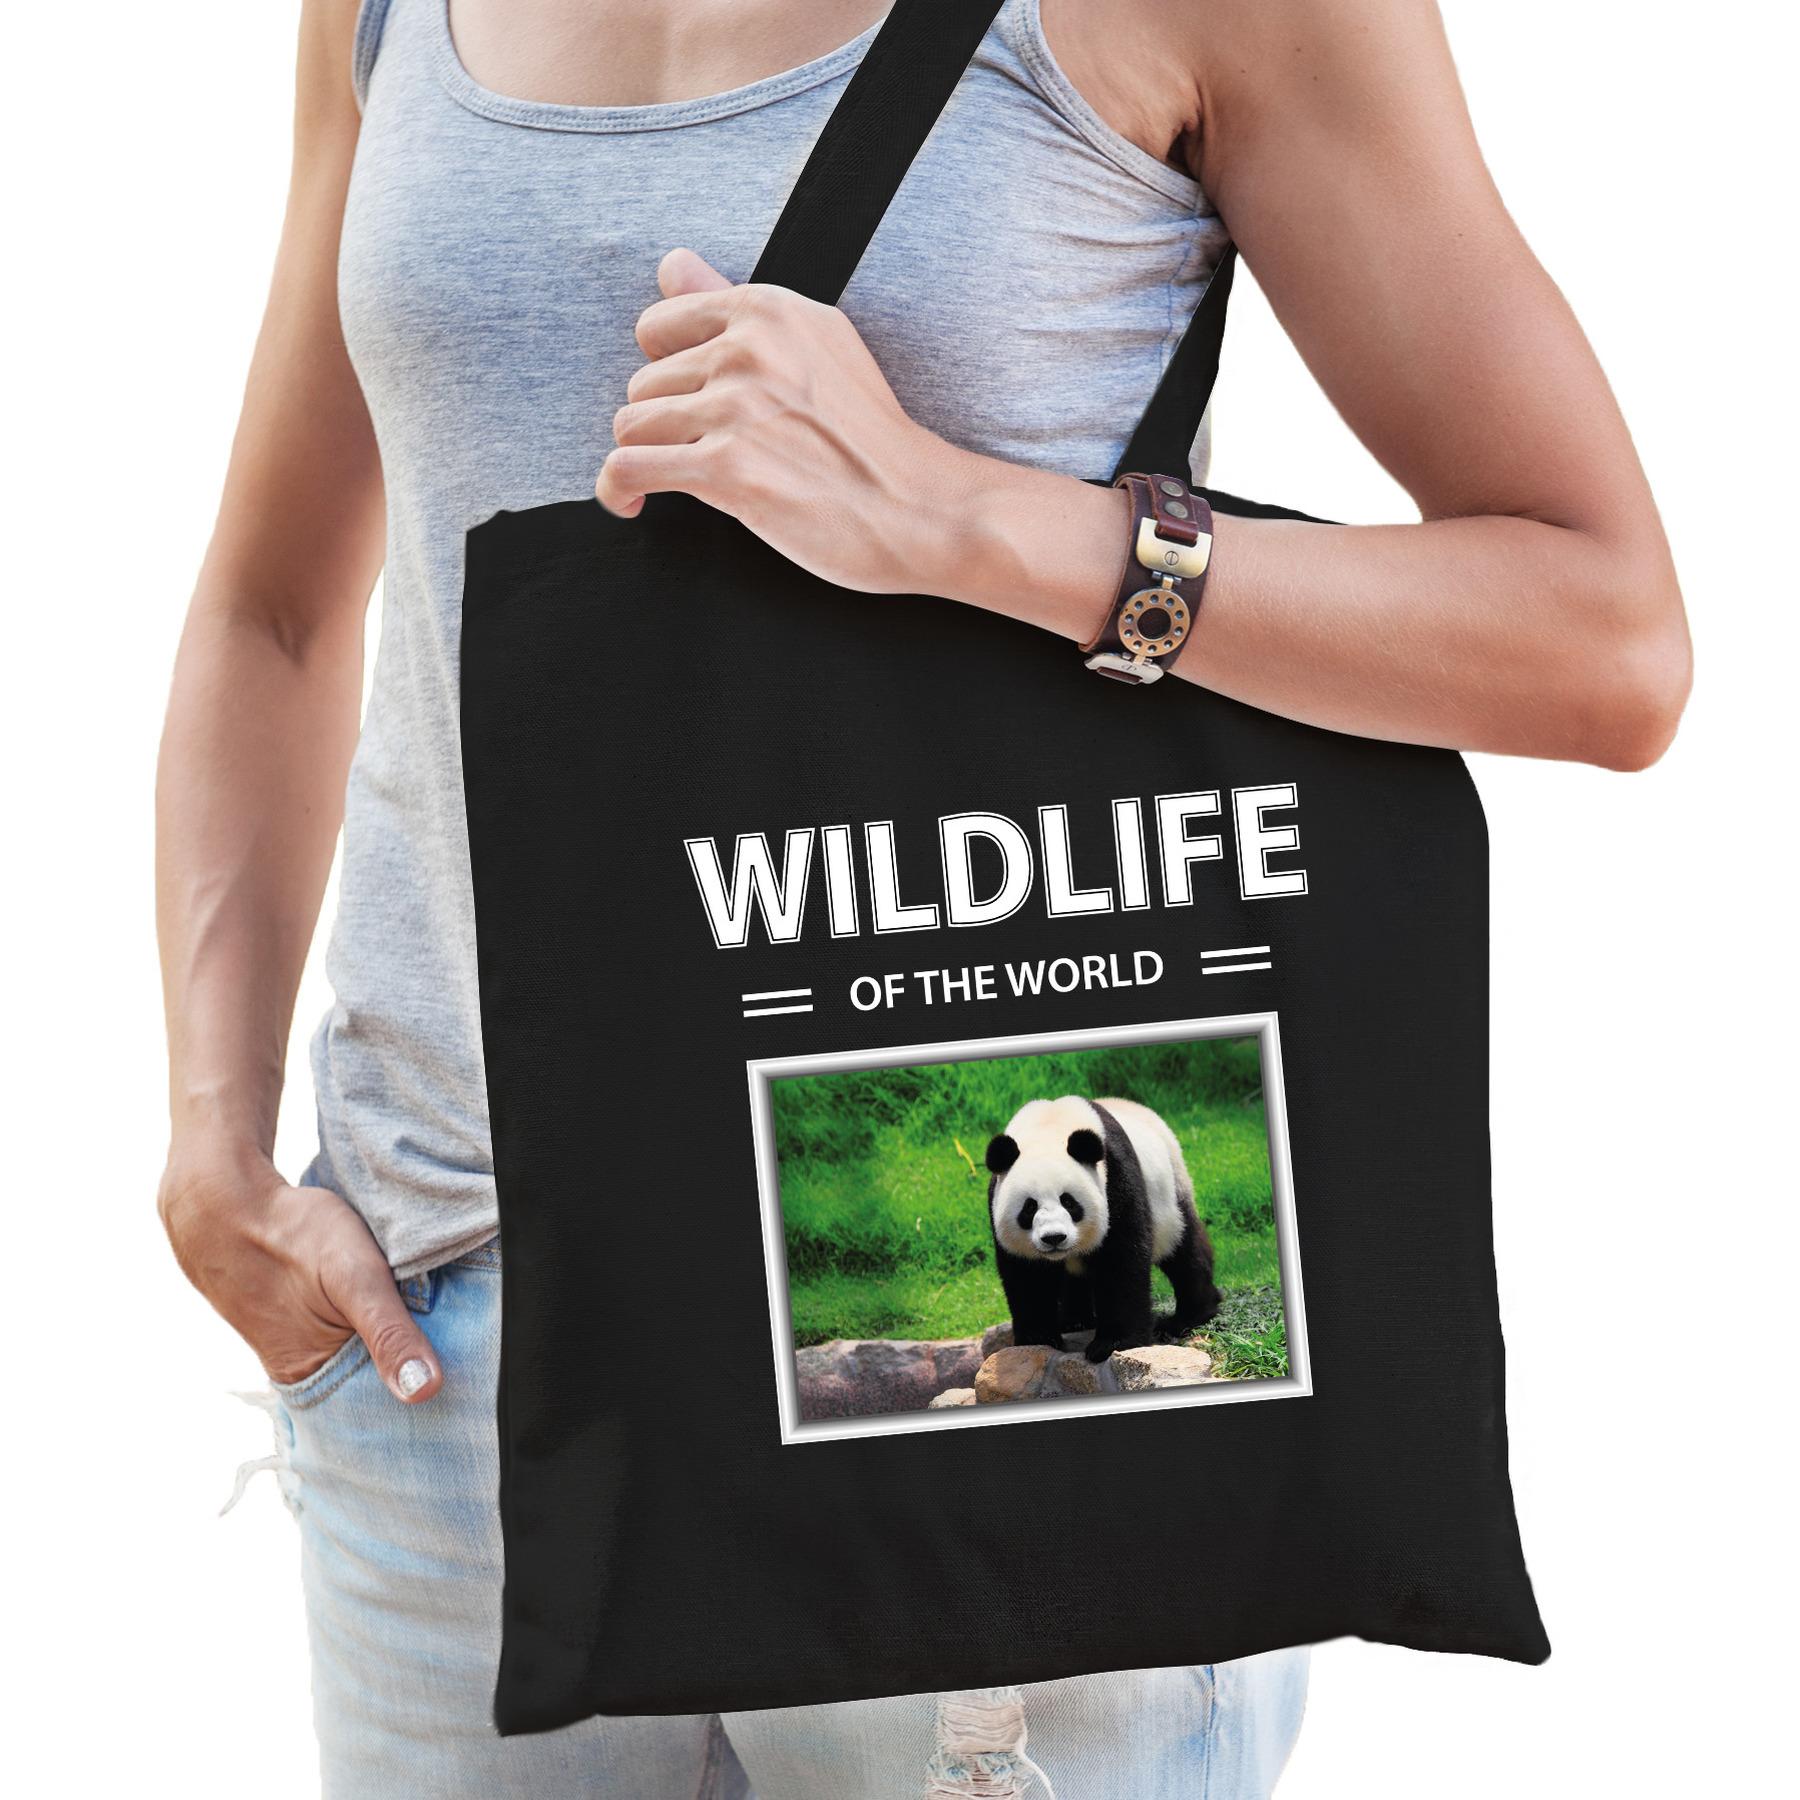 Katoenen tasje pandabeer zwart - wildlife of the world Panda cadeau tas